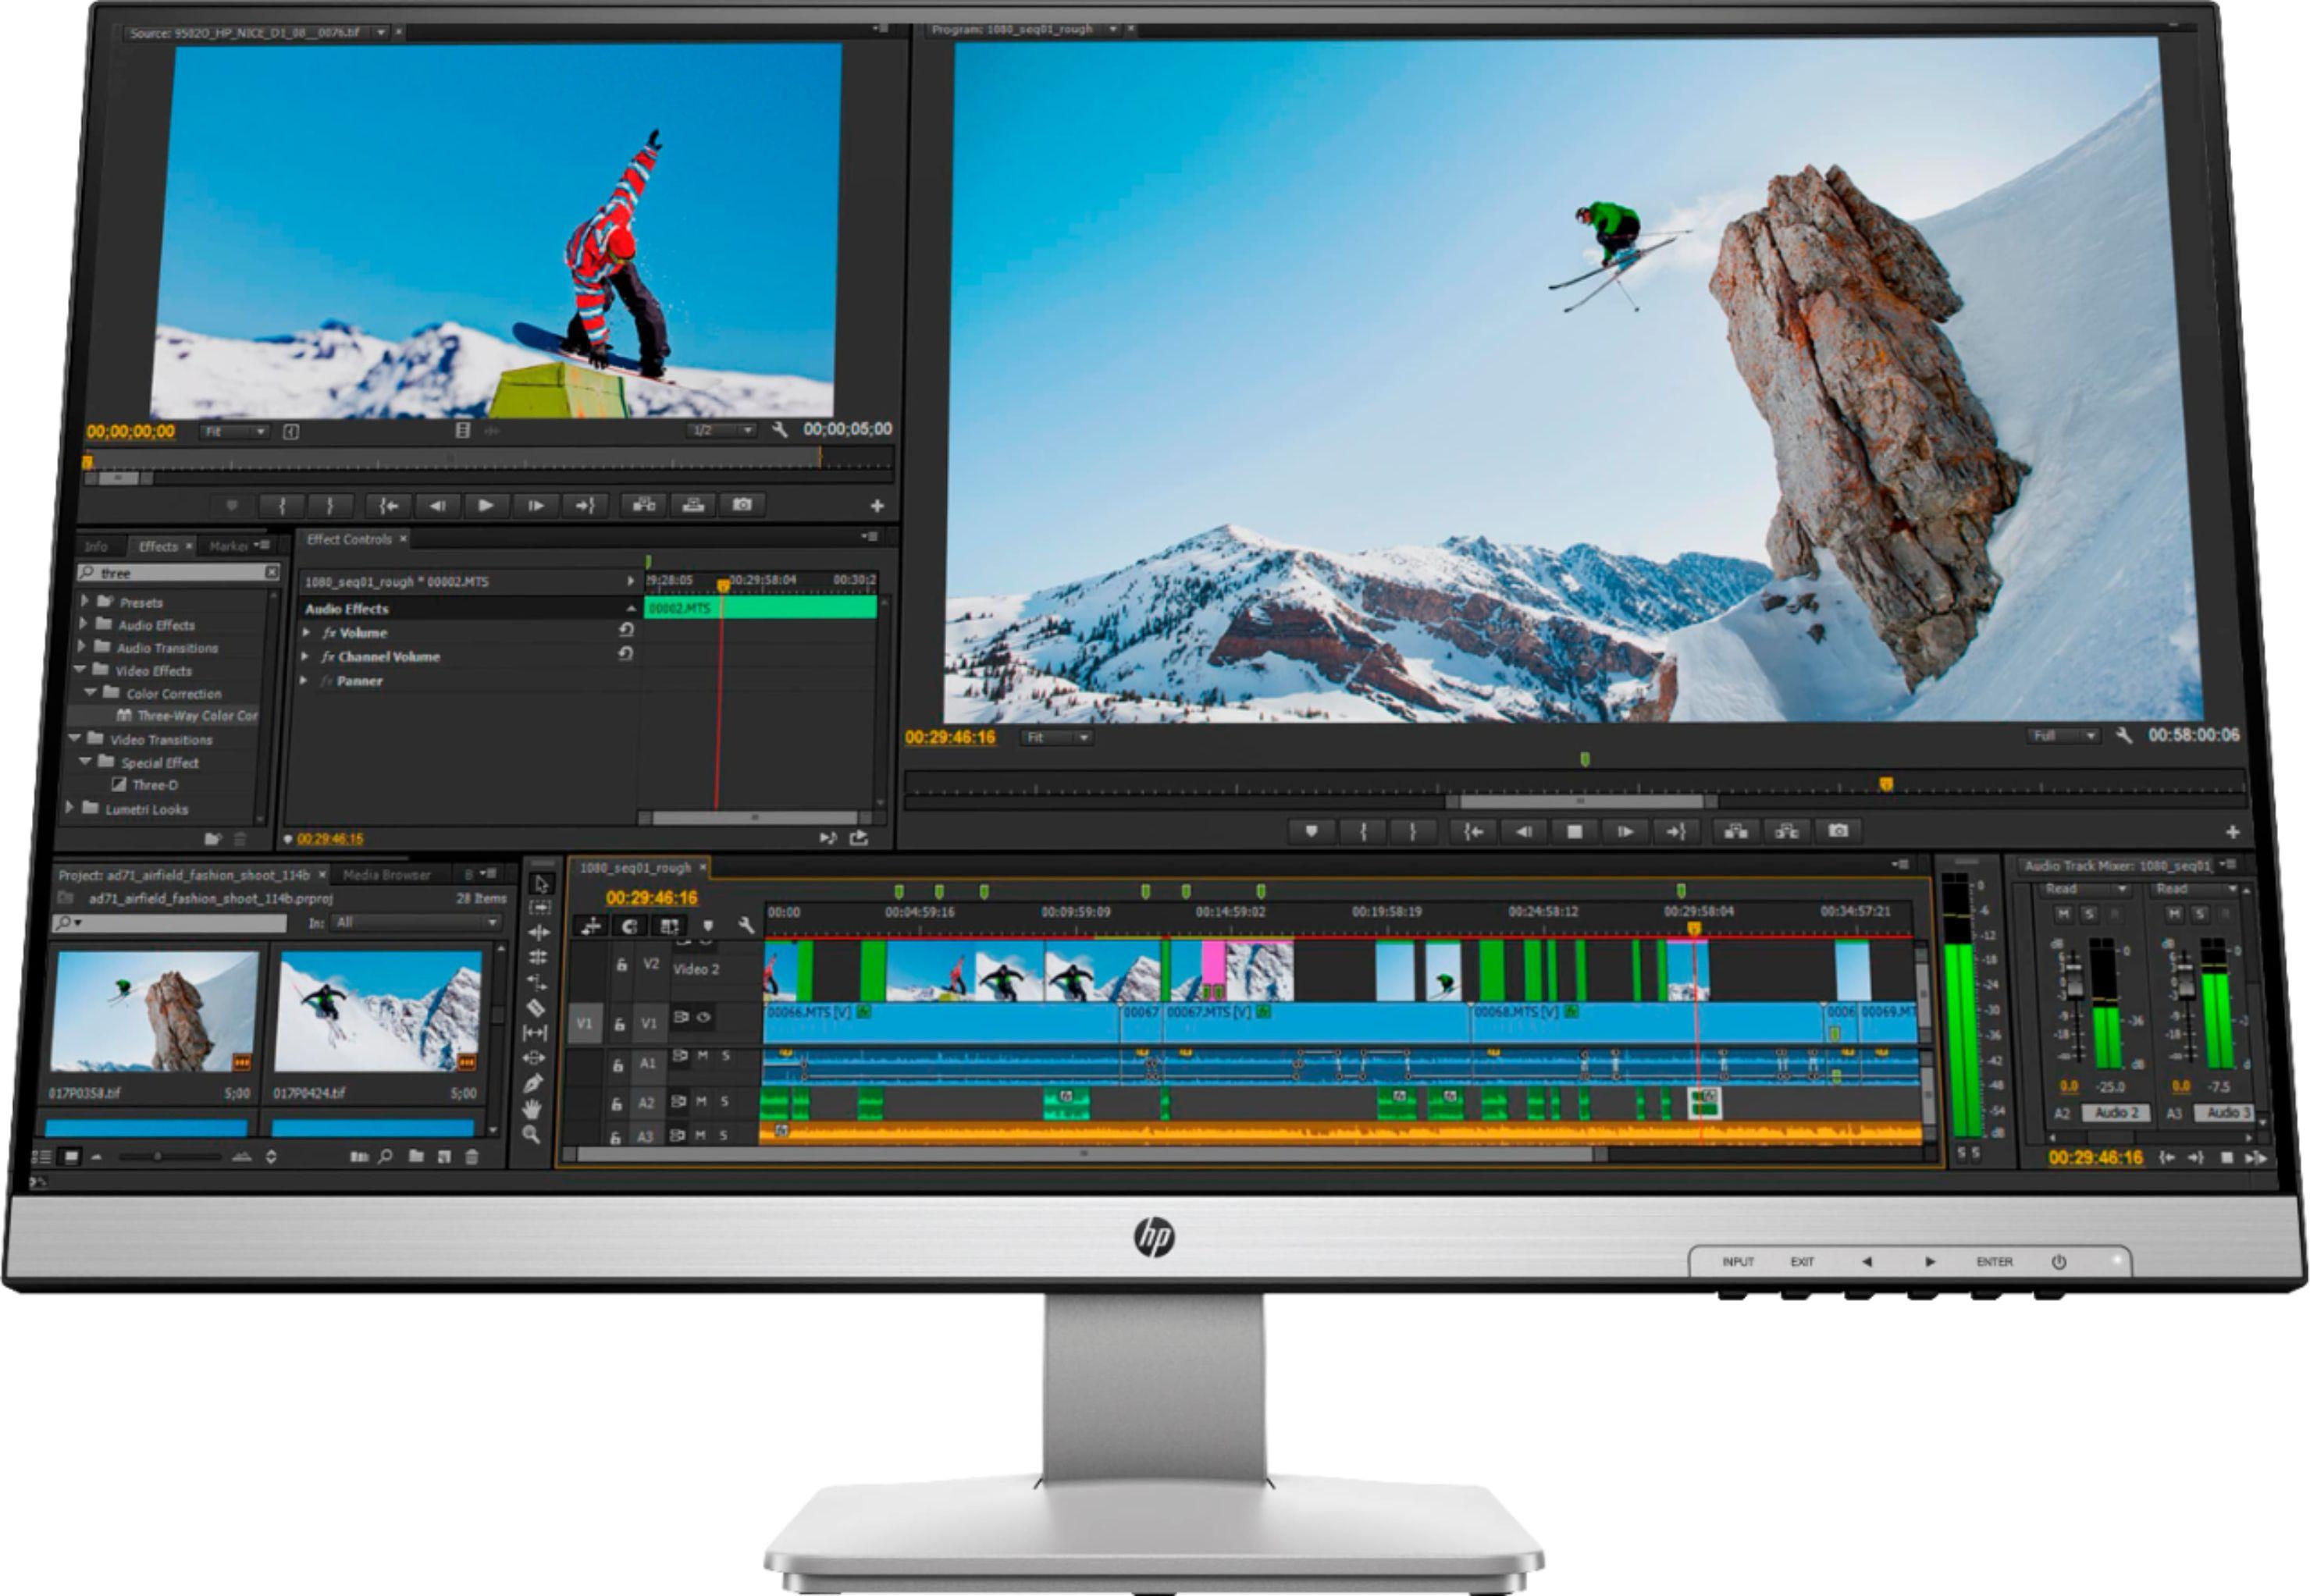 HP - 27q 27inch LED QHD Monitor $189.99 + Free Shipping @ Best Buy